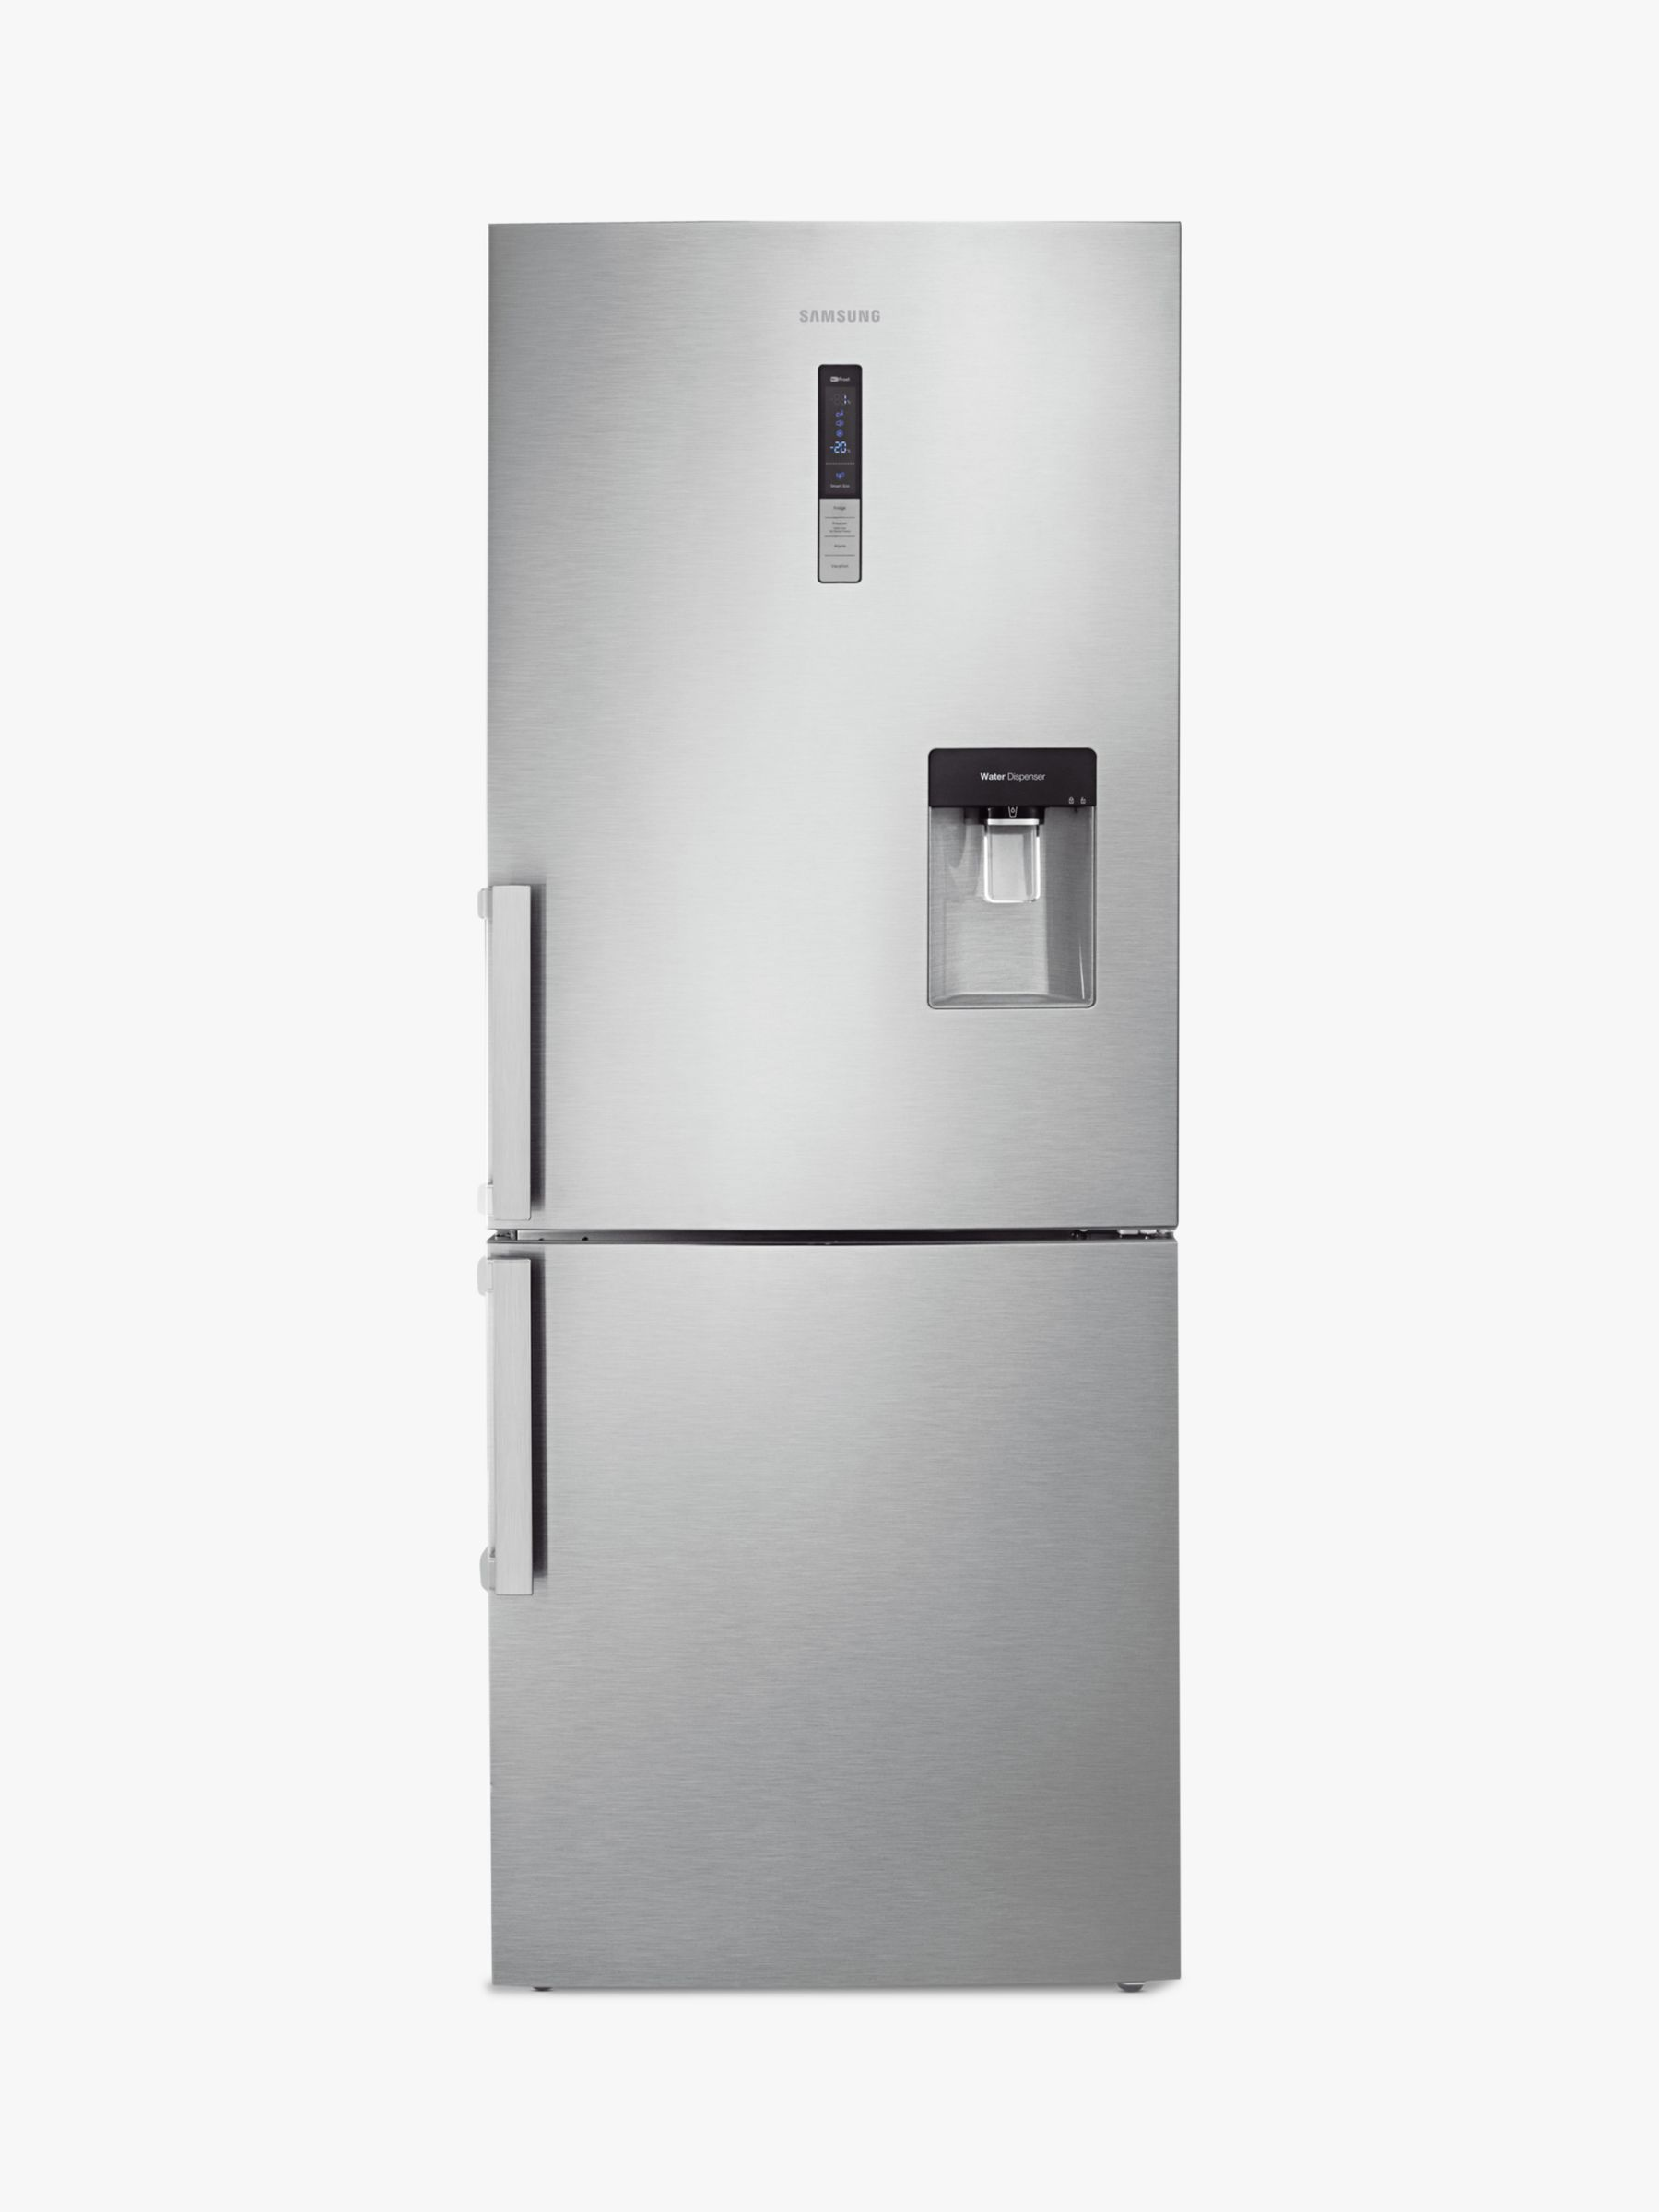 Samsung Samsung RL4362FBASL Fridge Freezer, A+ Energy Rating, 70cm Wide, Stainless Steel